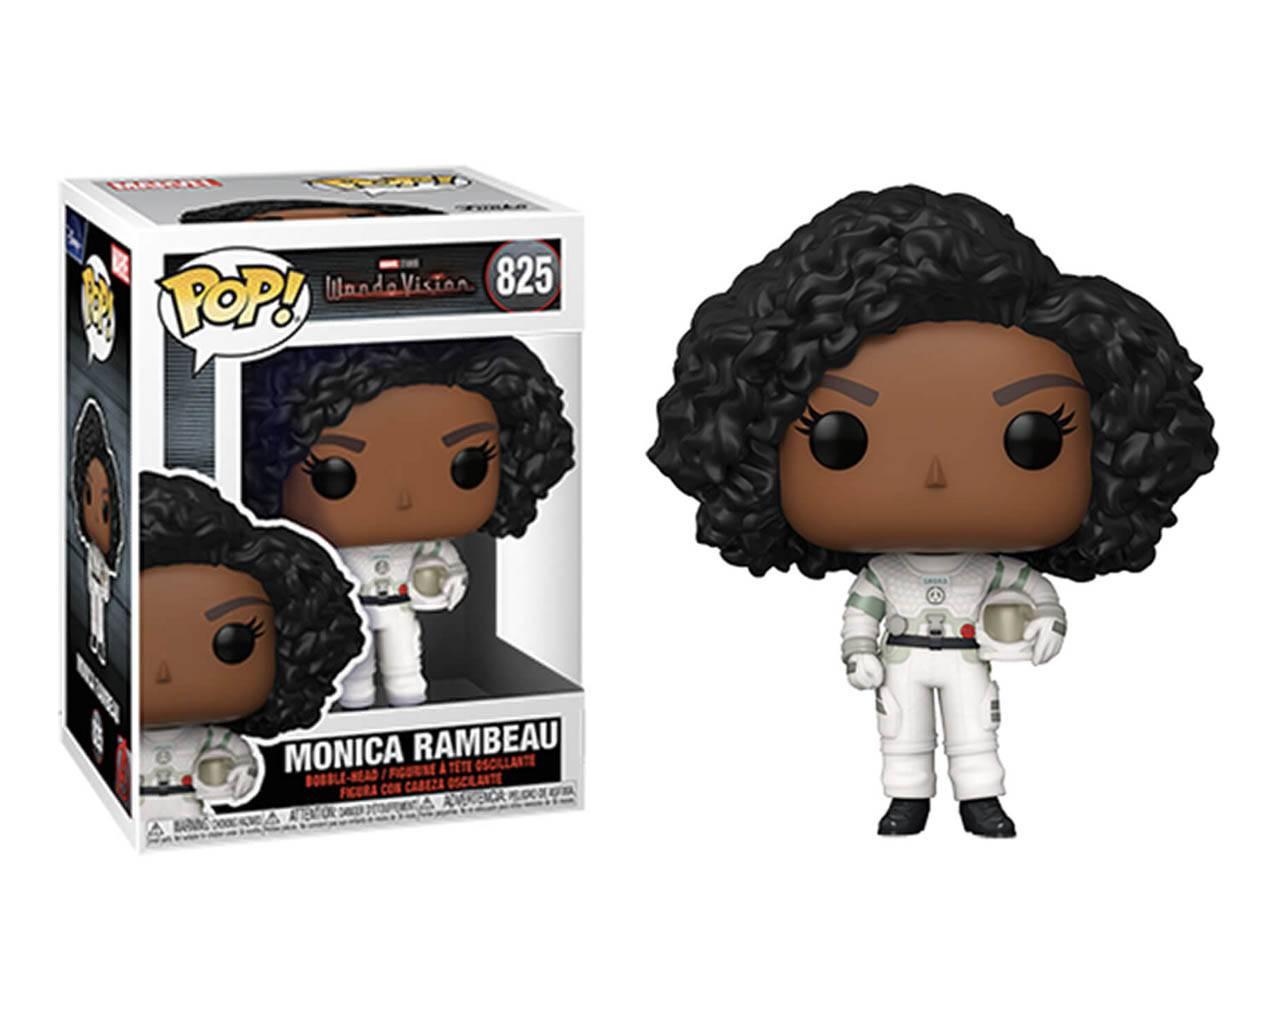 Monica Rambeau Pop! Vinyl